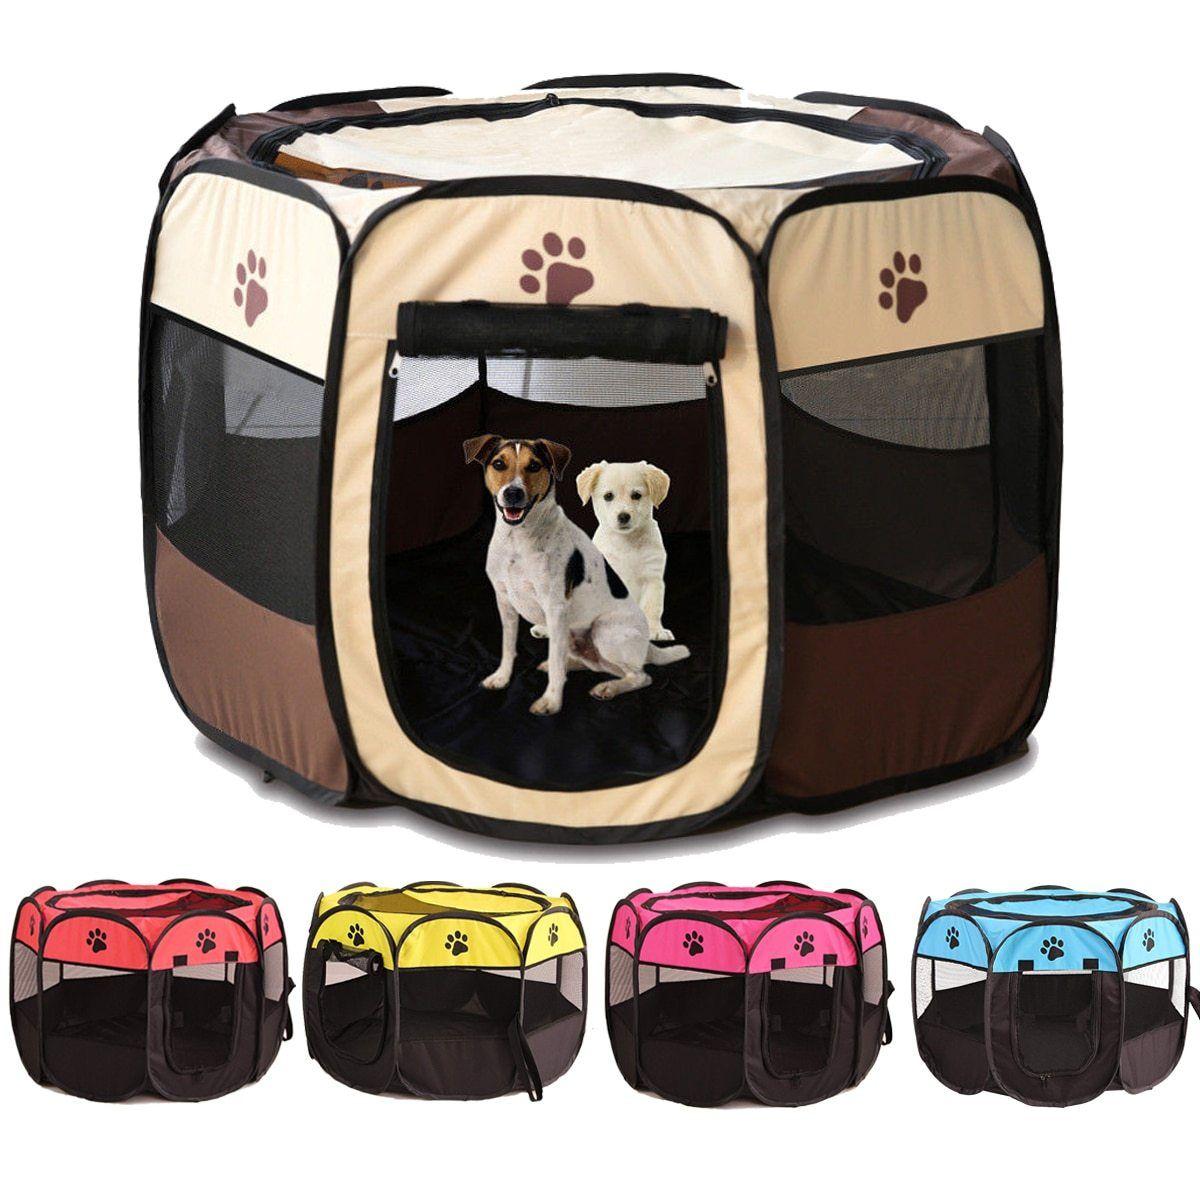 Portable Pet Crate Playpen Foldable Mesh Water Resistant Indoor Outdoor Dog Playpen Puppy Kennel Cat Cages